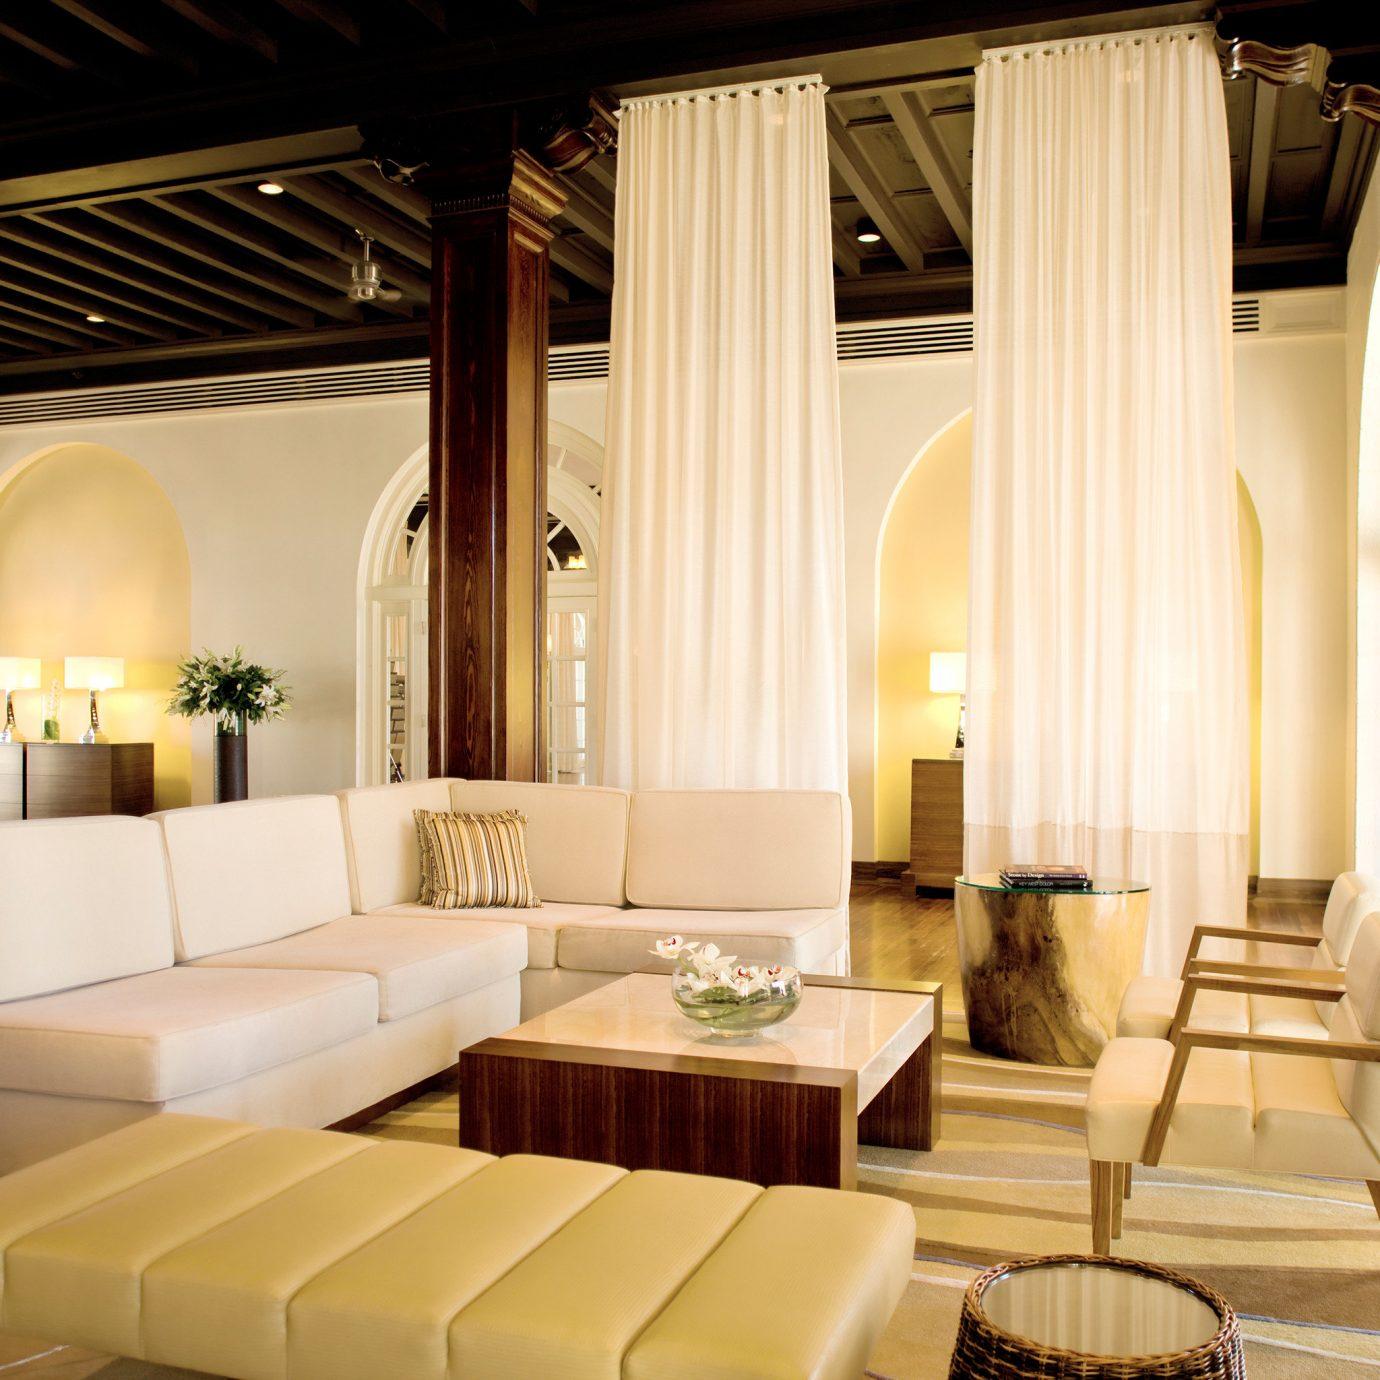 Florida Hip Hotels Lounge Luxury Modern living room property Lobby Suite home lighting condominium mansion Villa